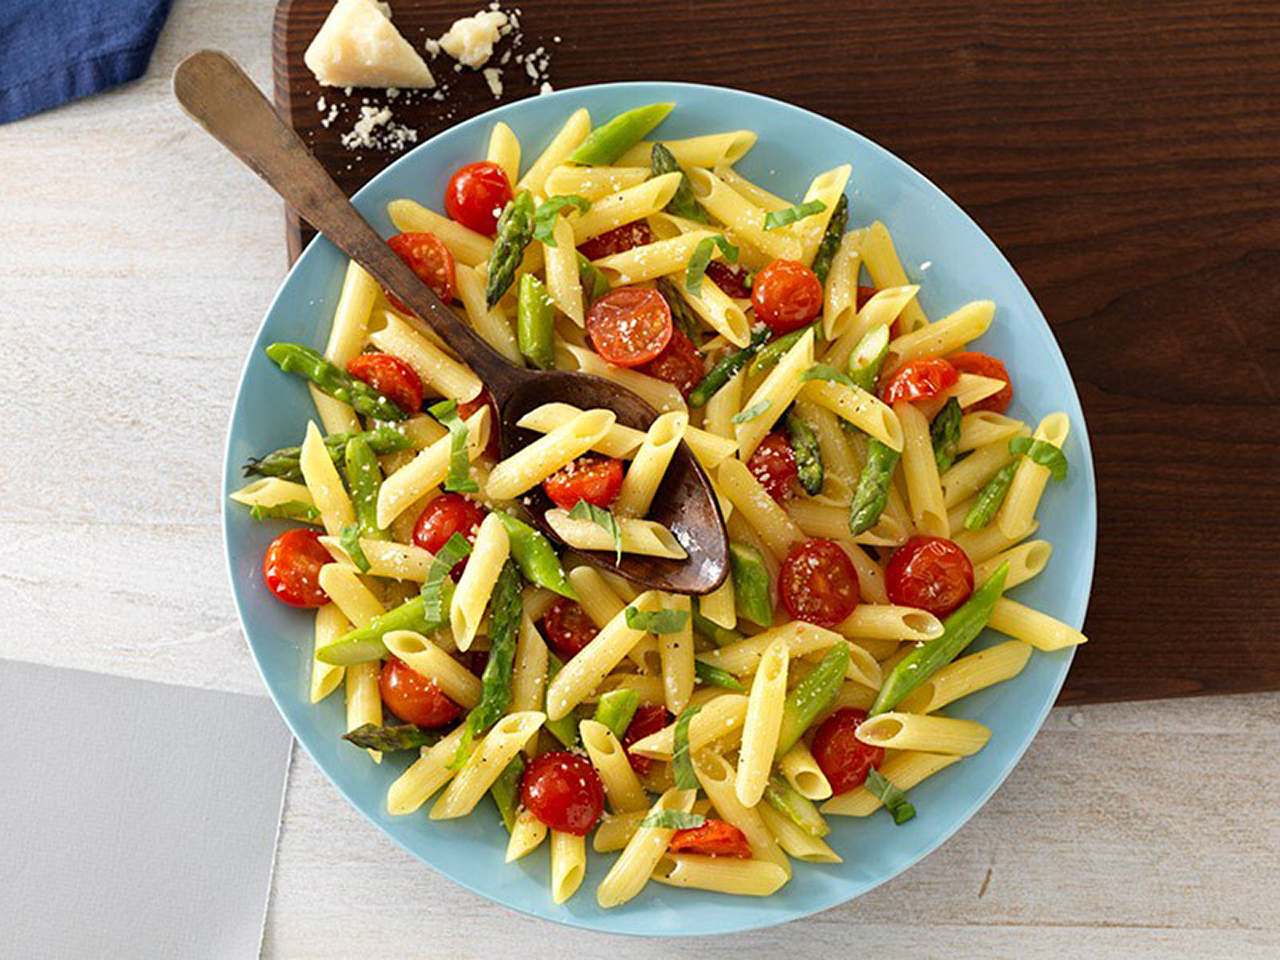 Barilla® Gluten Free Penne with Sauteed Veggies